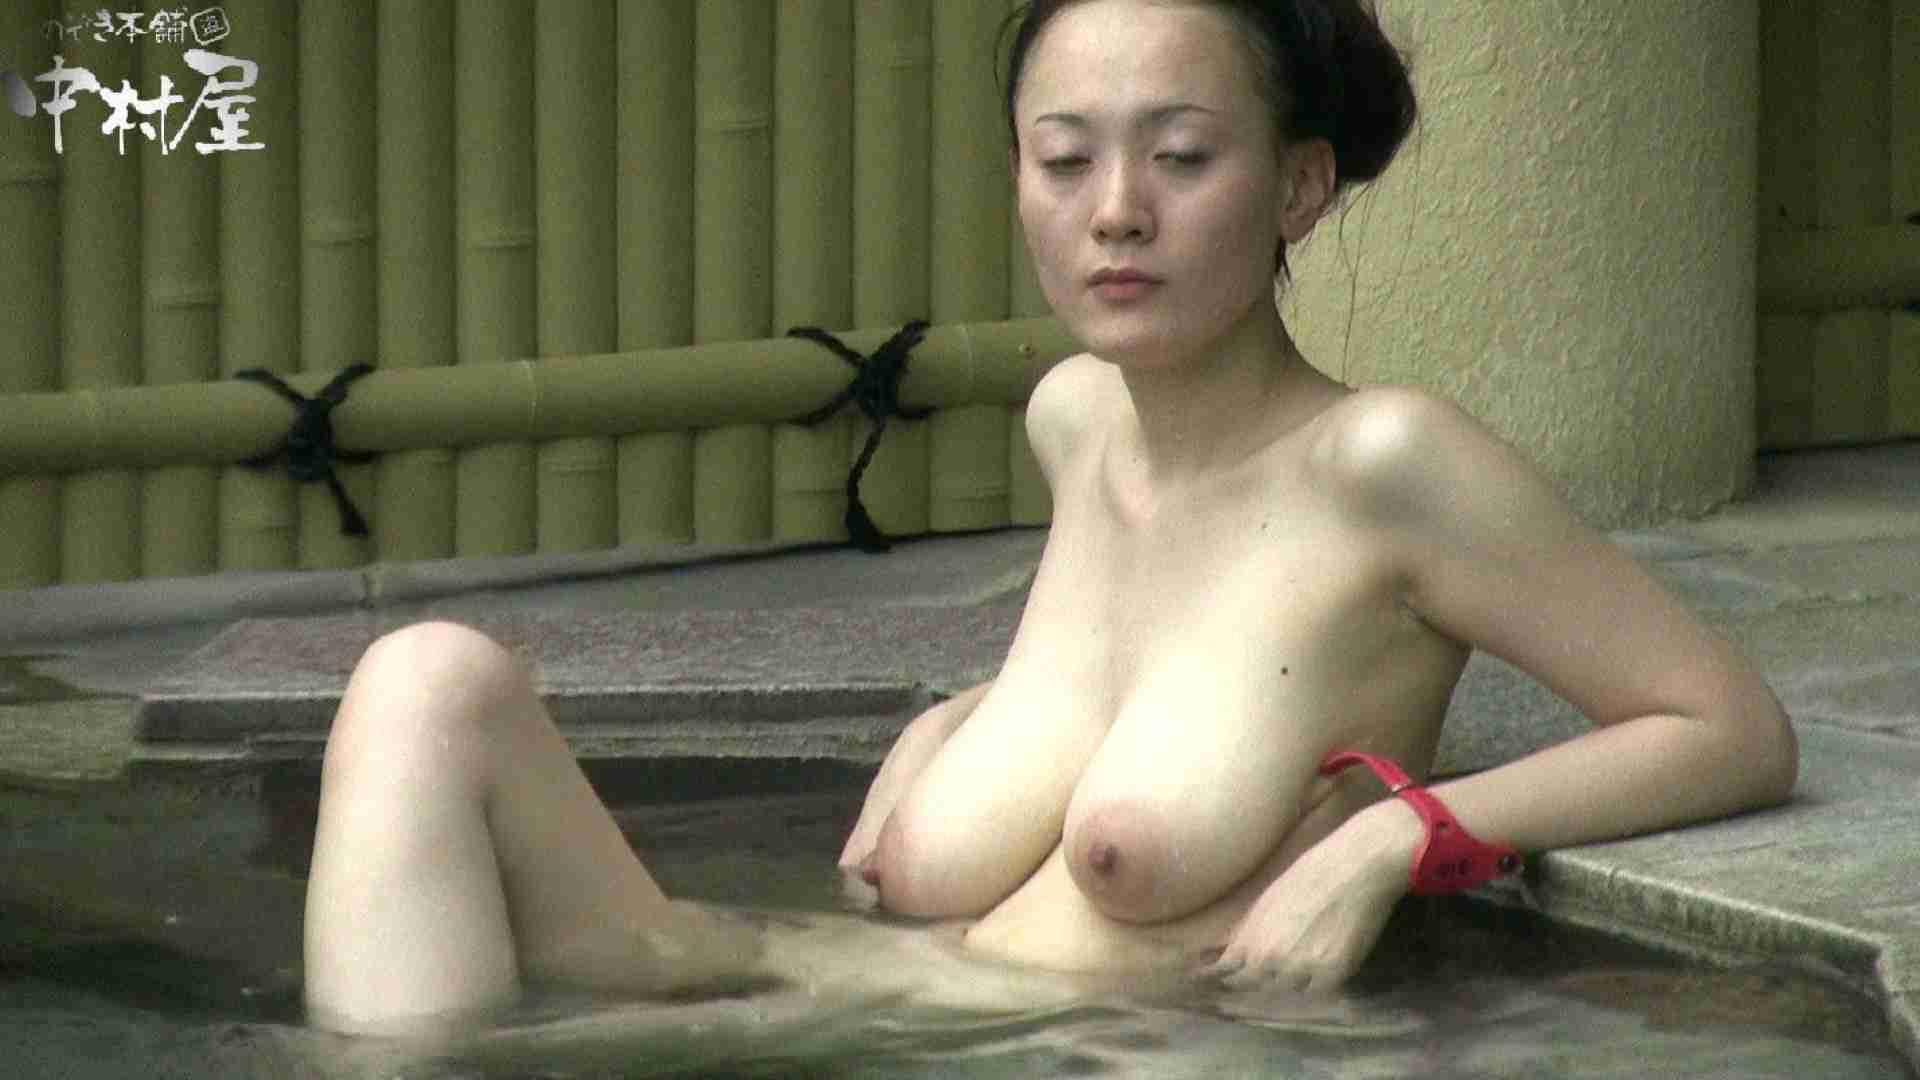 Aquaな露天風呂Vol.903 露天風呂突入 | 盗撮師作品  98pic 70